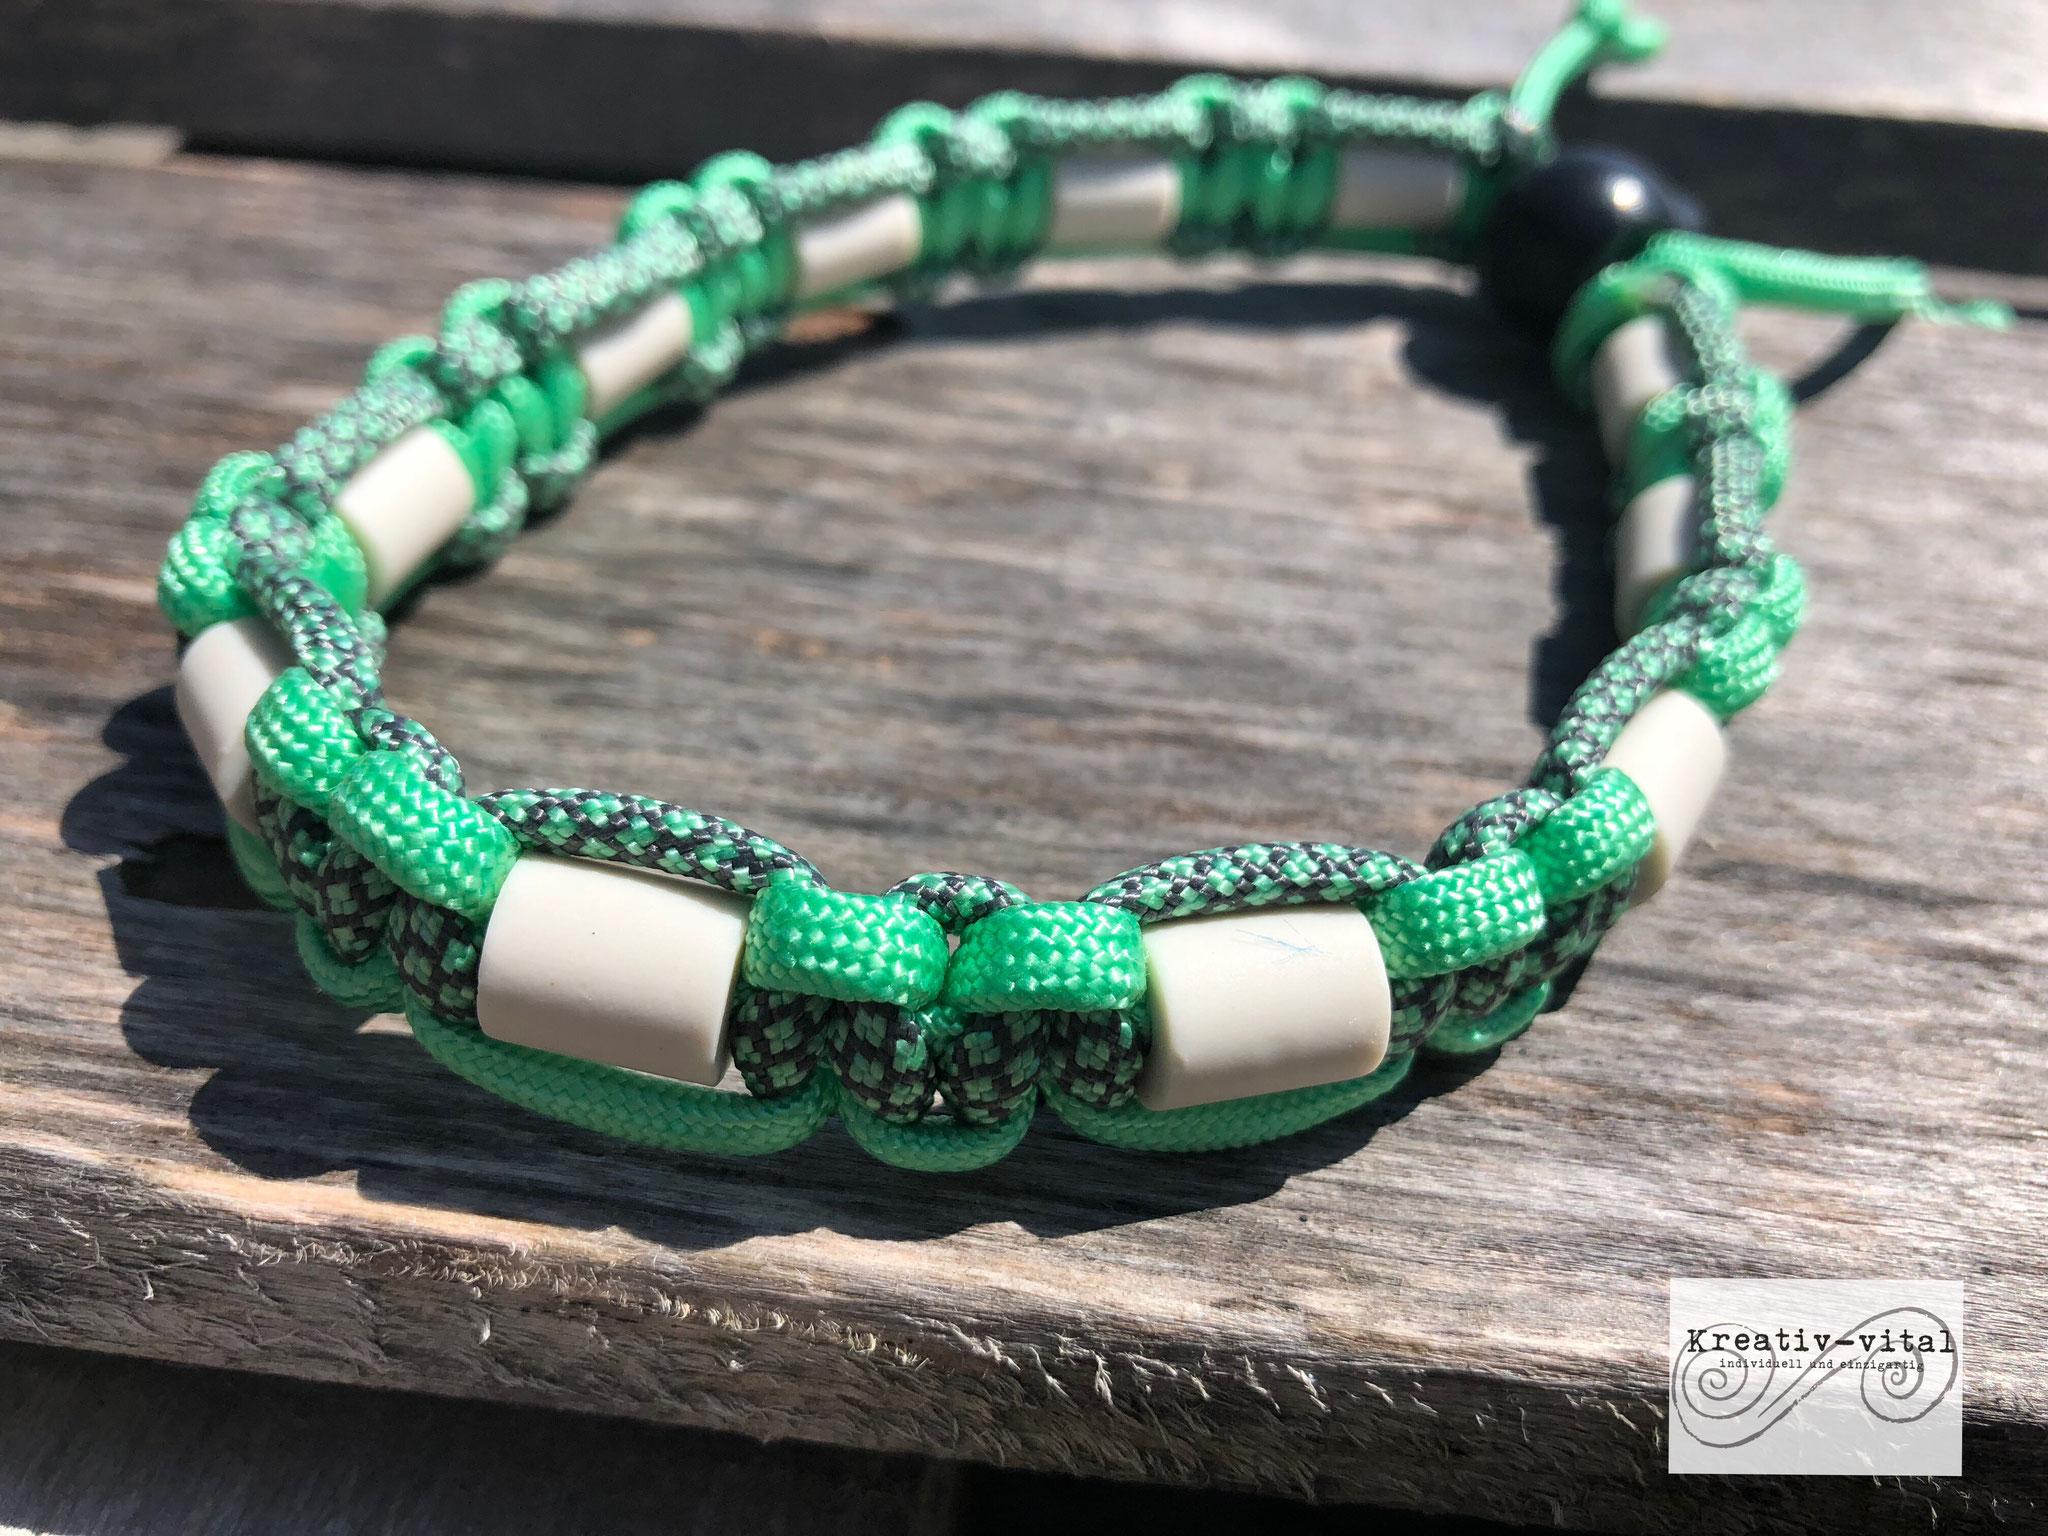 EM Keramik Halsband für Hund/Katze 32-35cm Halsumfang Mint/Charchoal grey mint